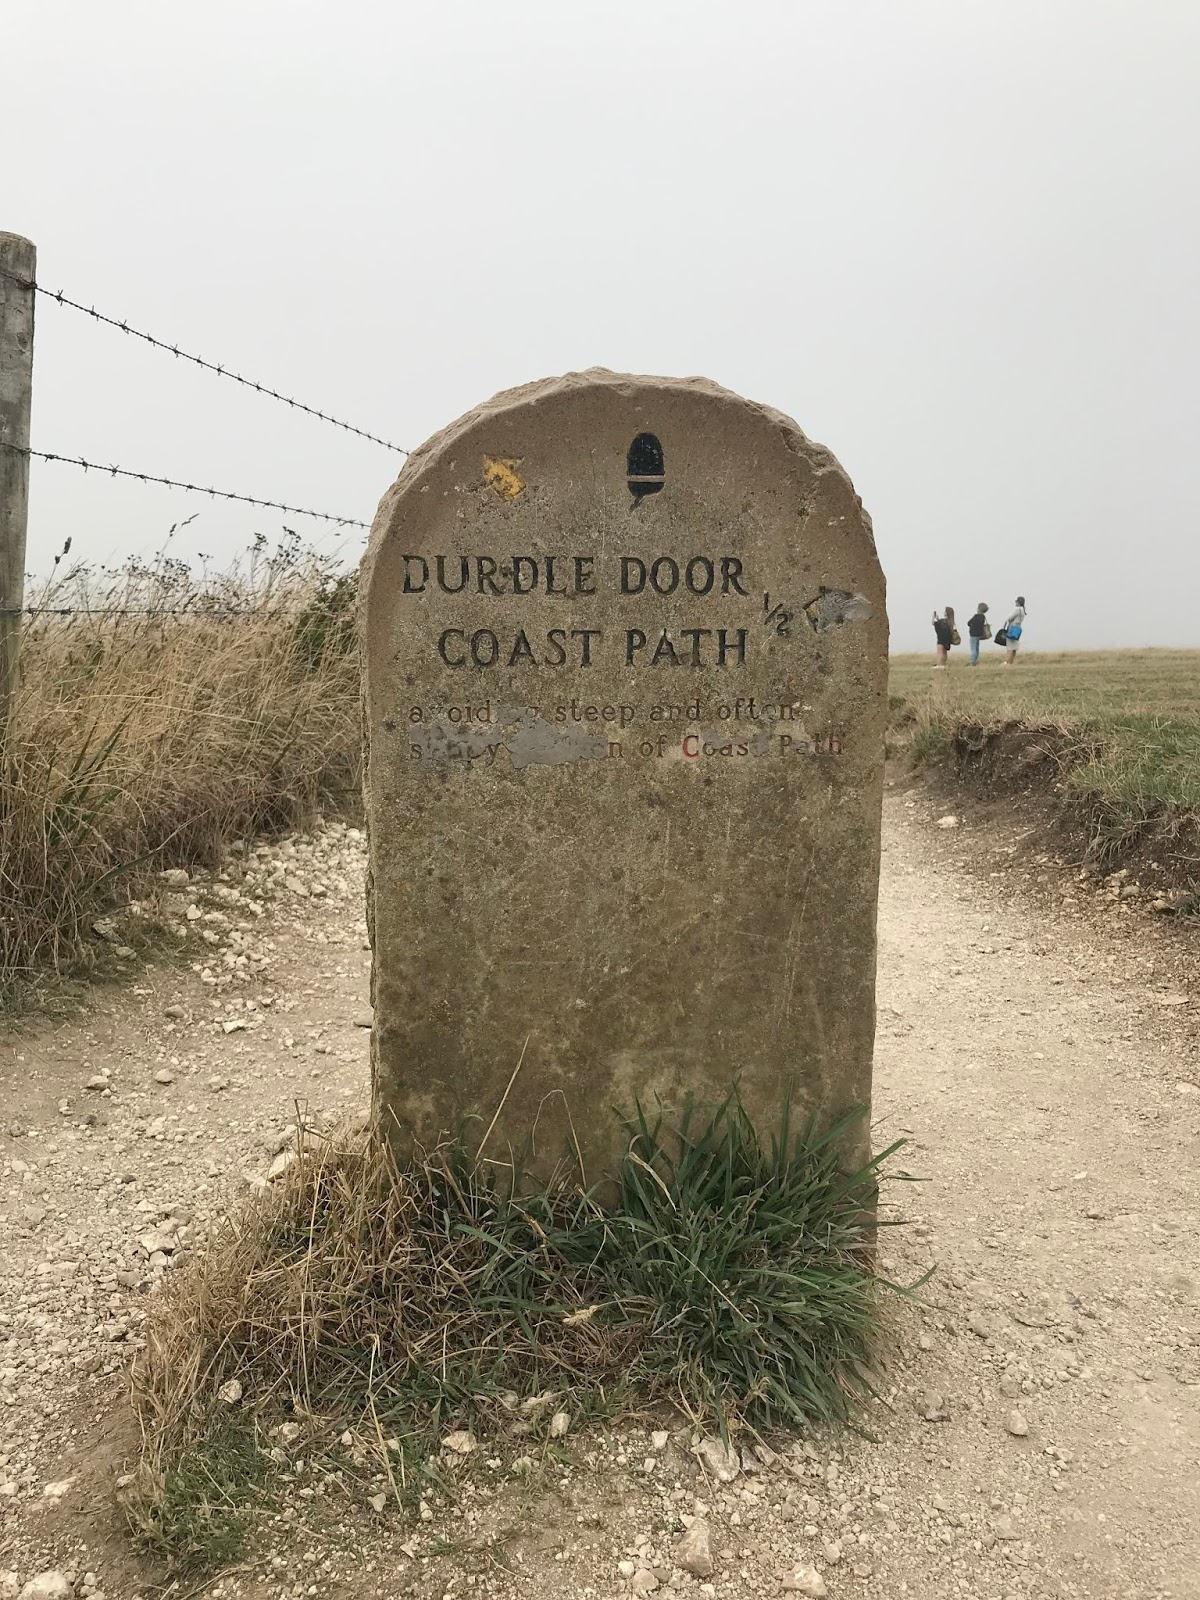 Jurassic coastal path to Durdle Door